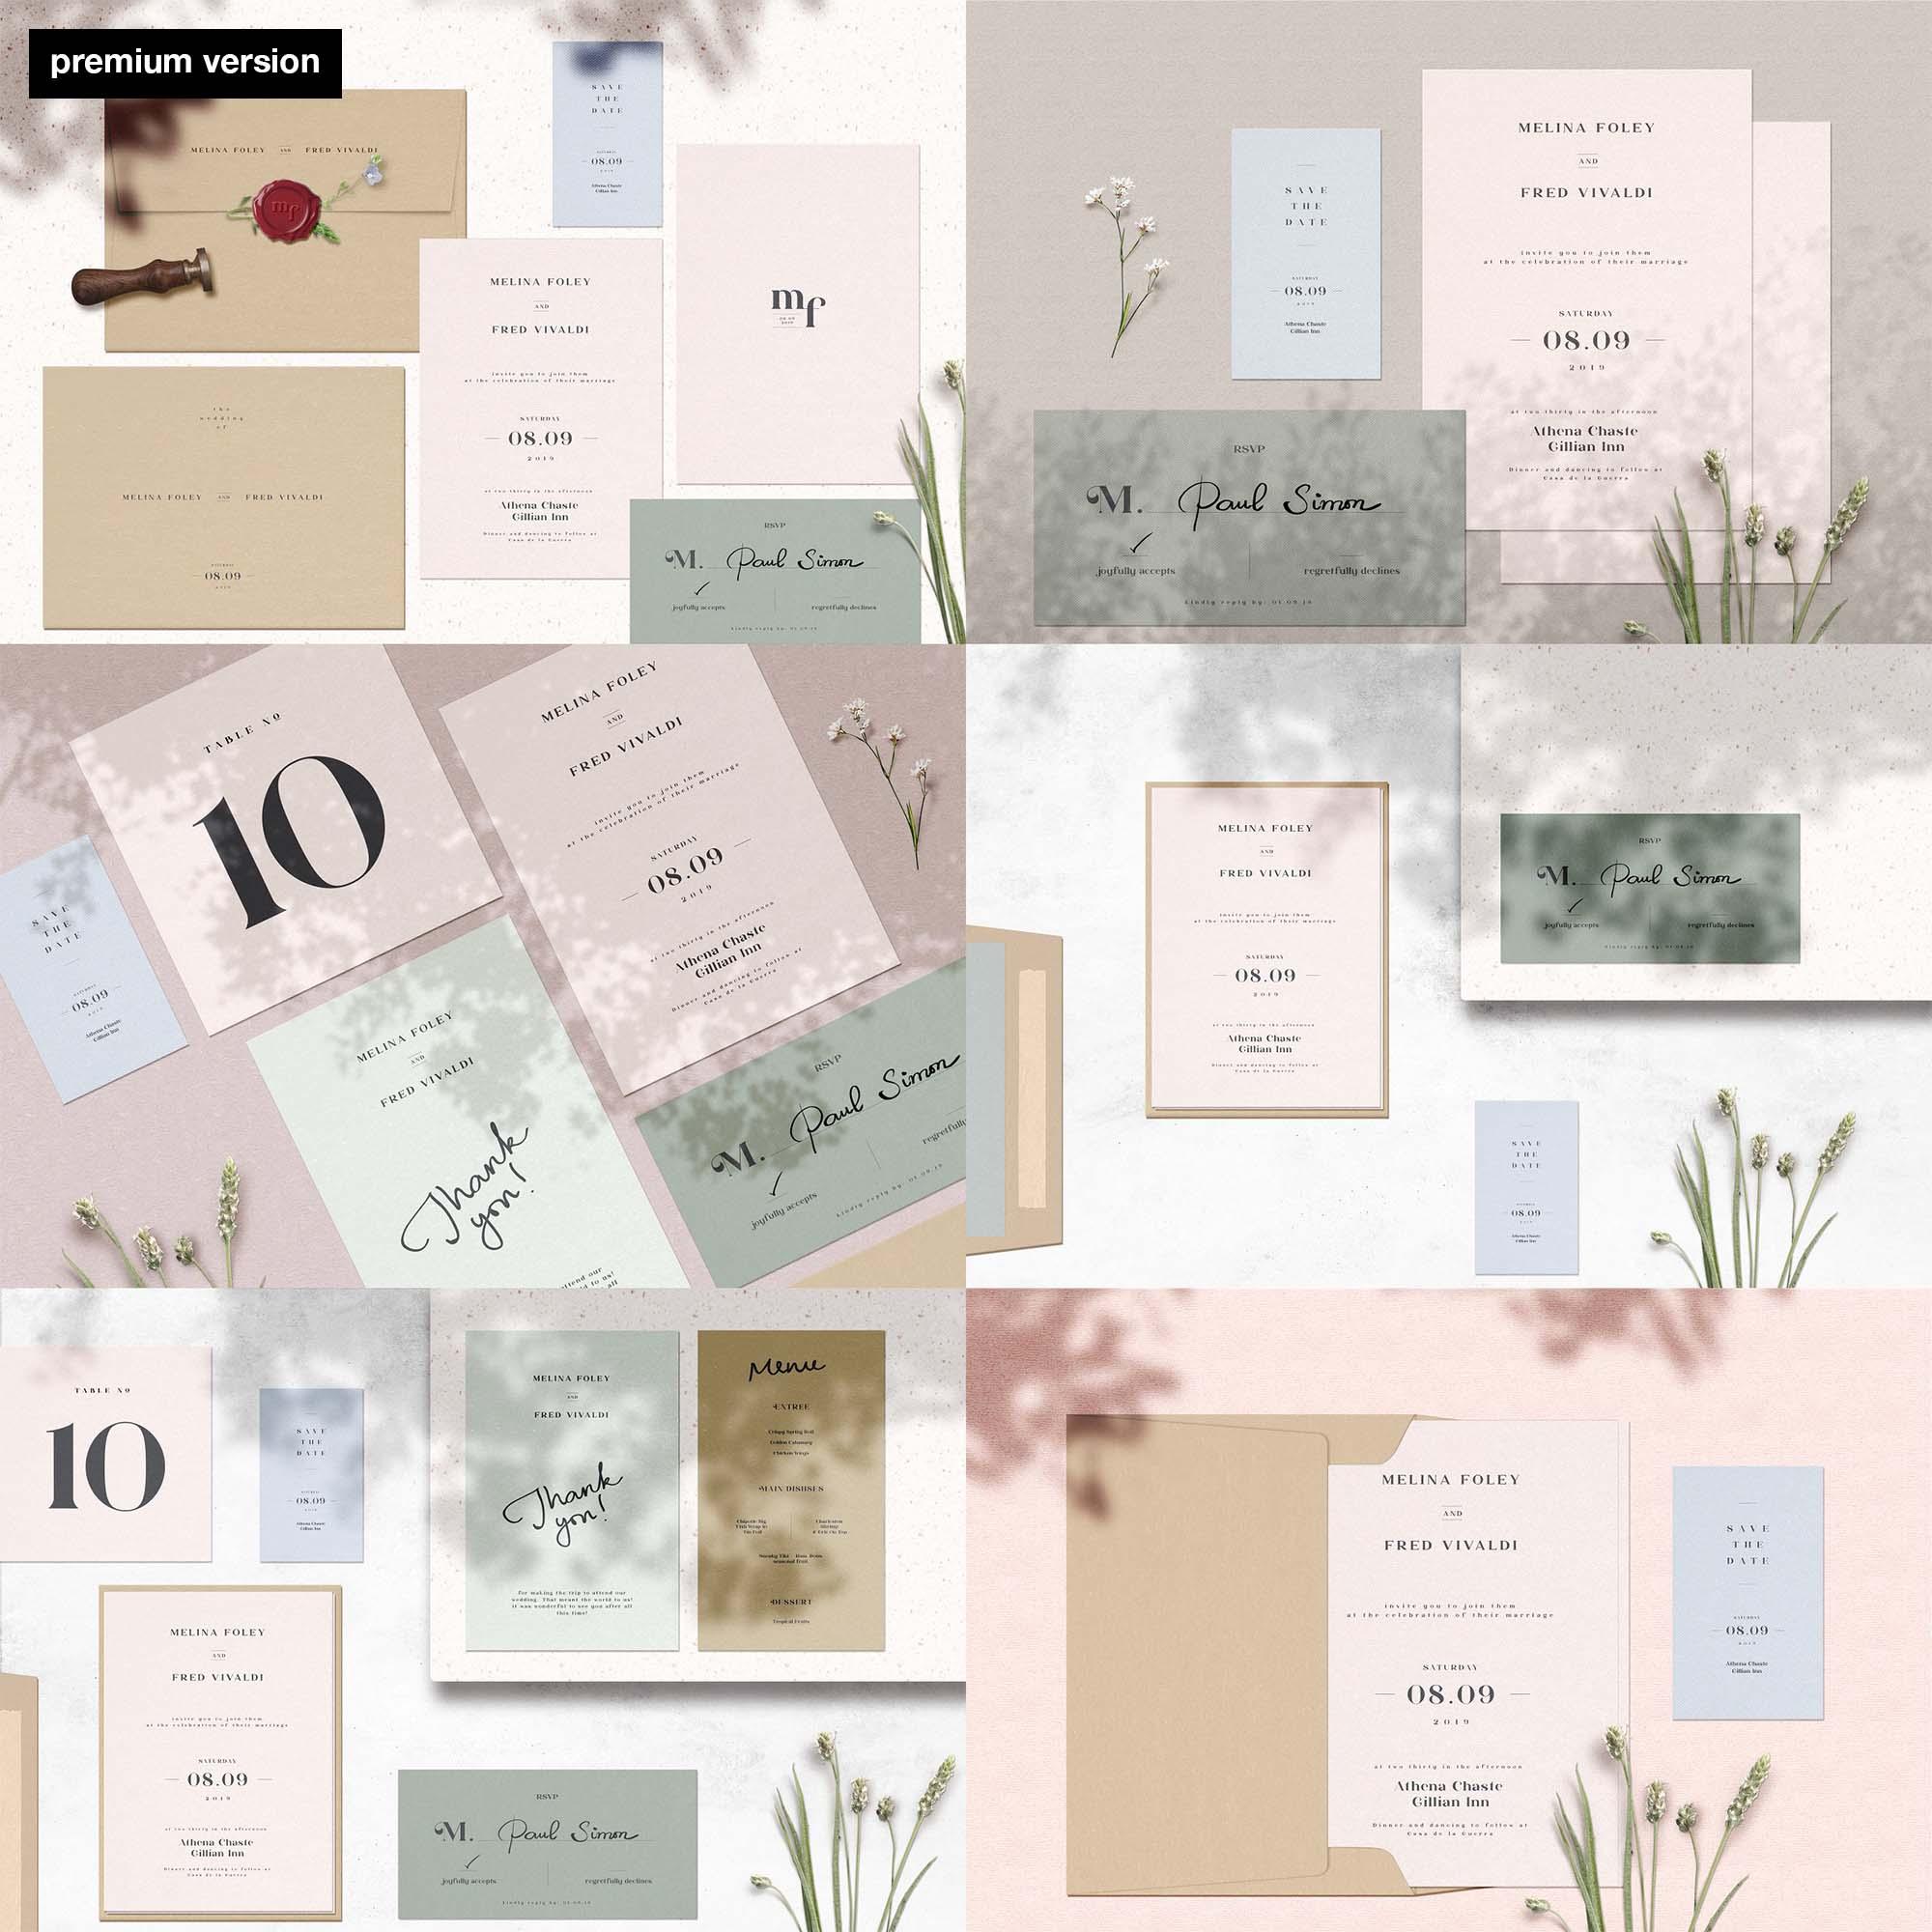 Wedding Cards Mockup - Premium Version